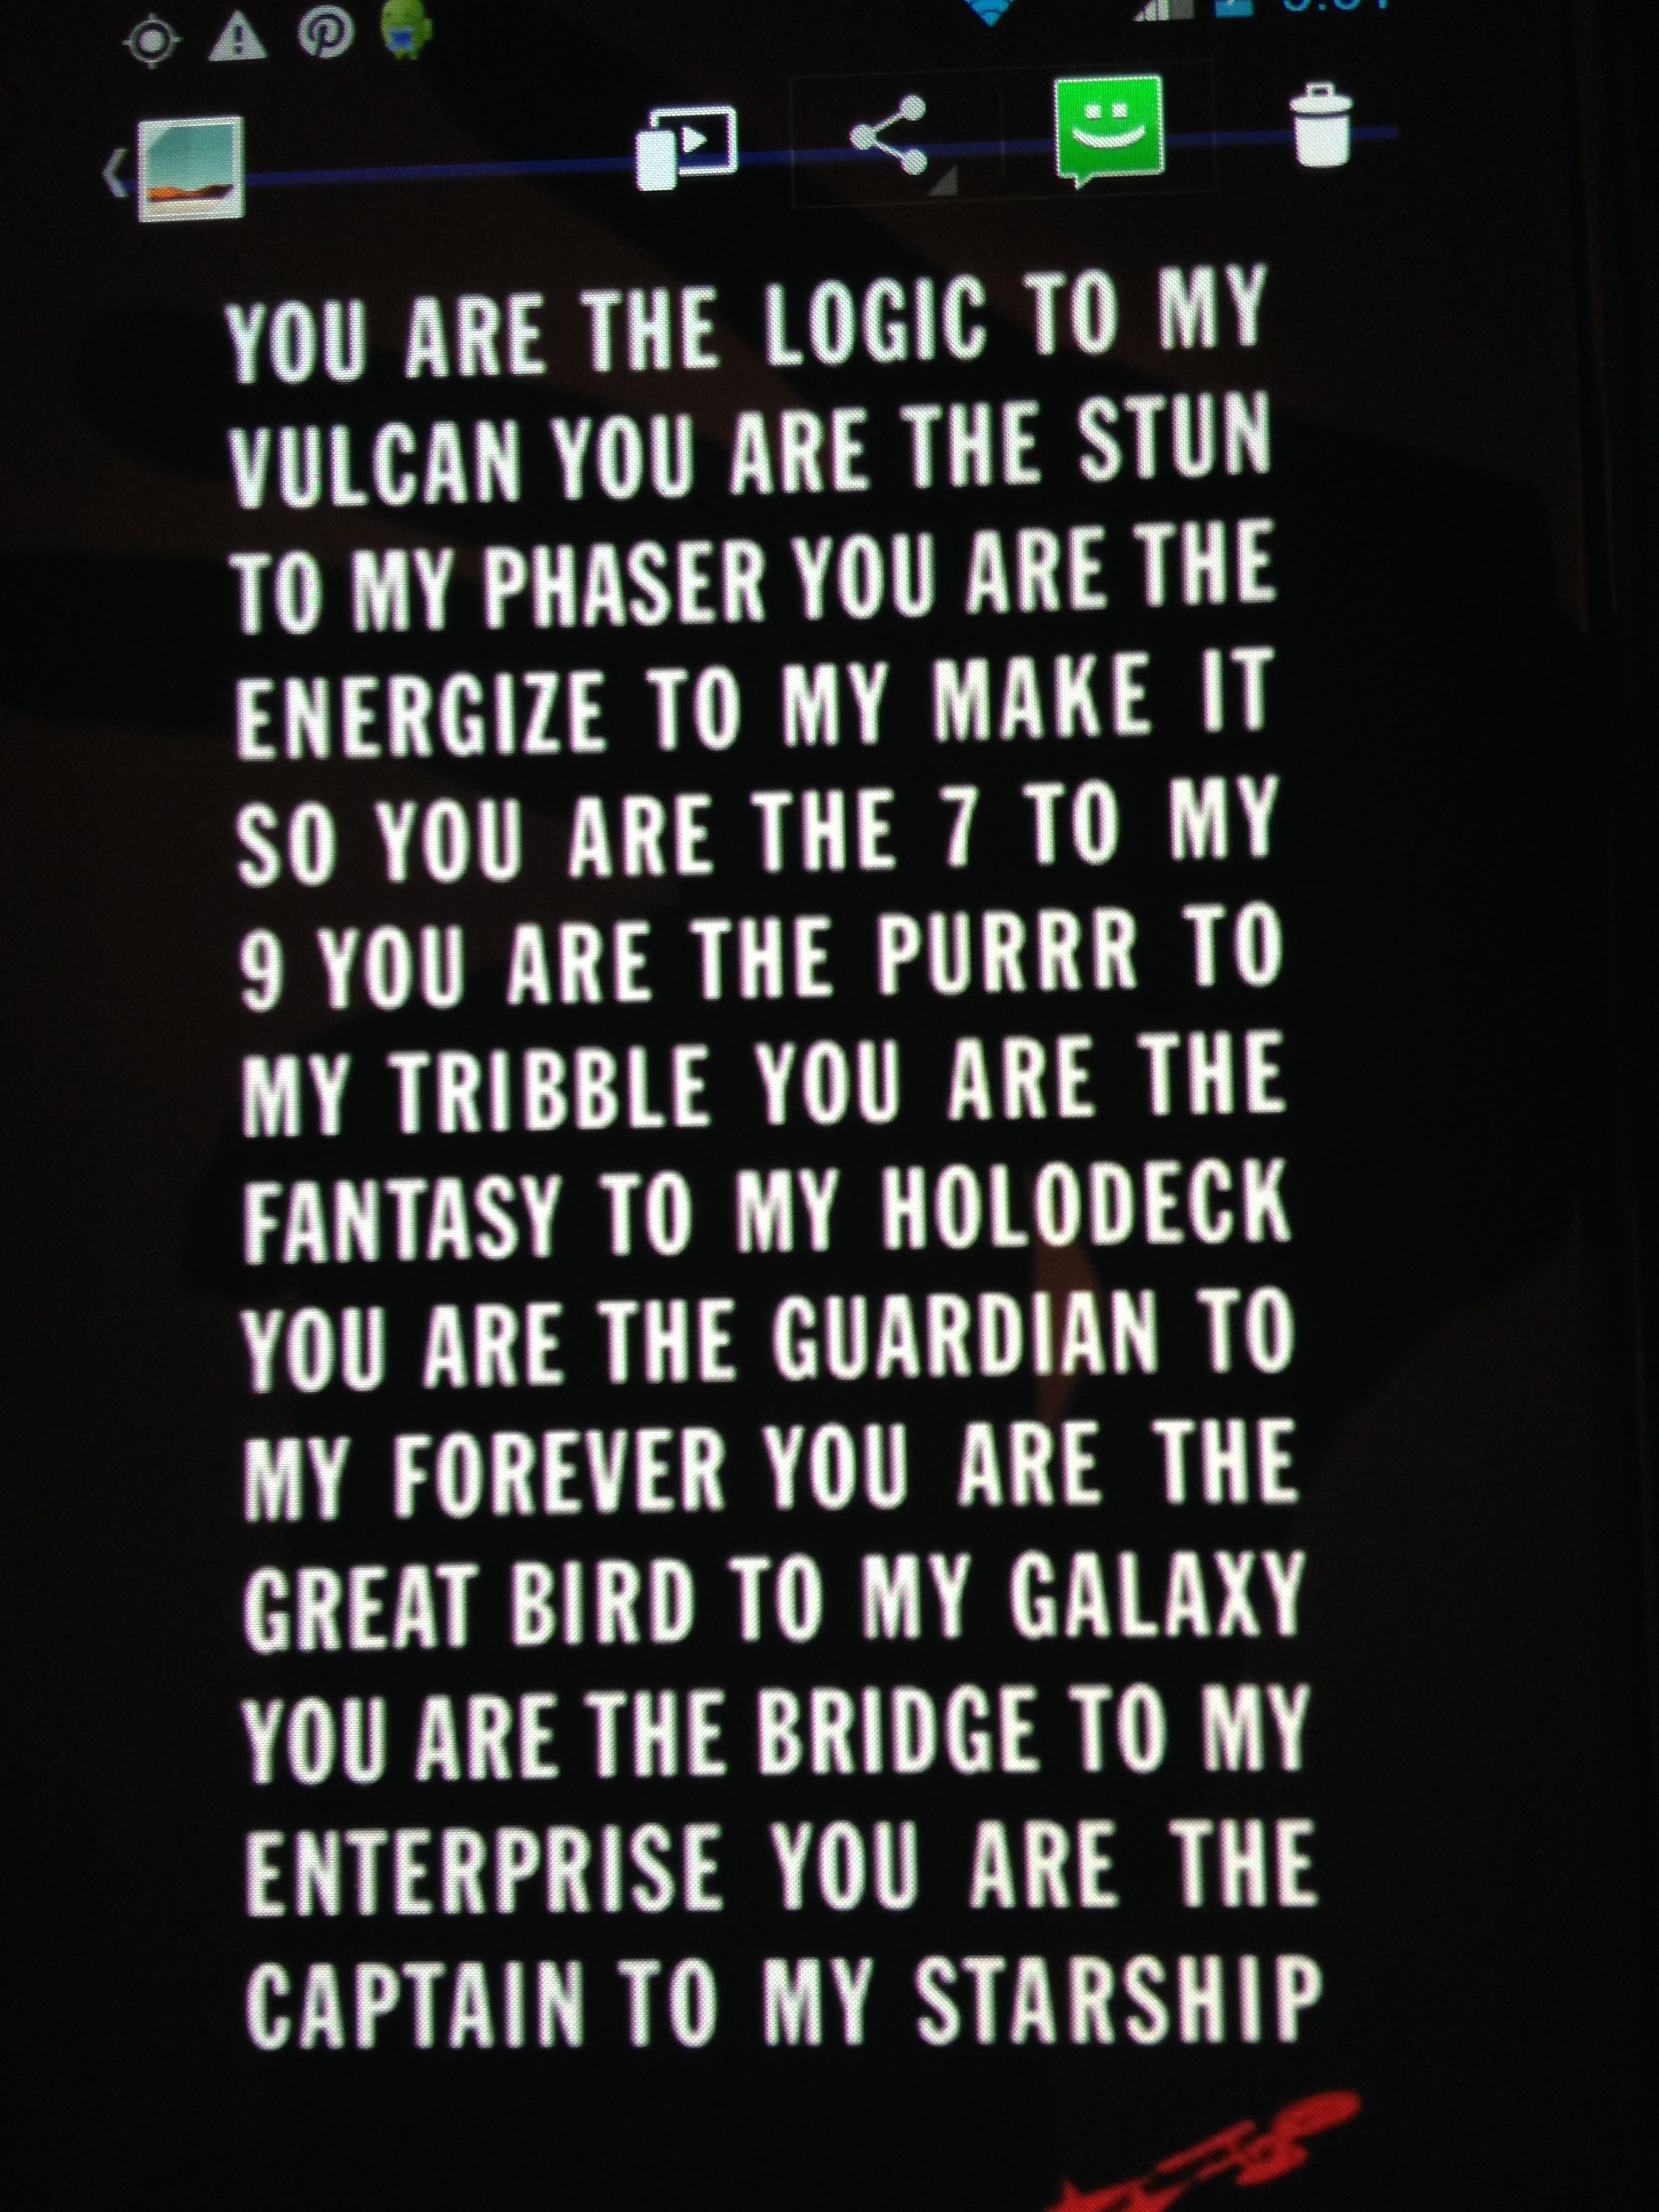 Pin by LexiLuna on Quotes | Pinterest | Star trek, Trek and Fandom